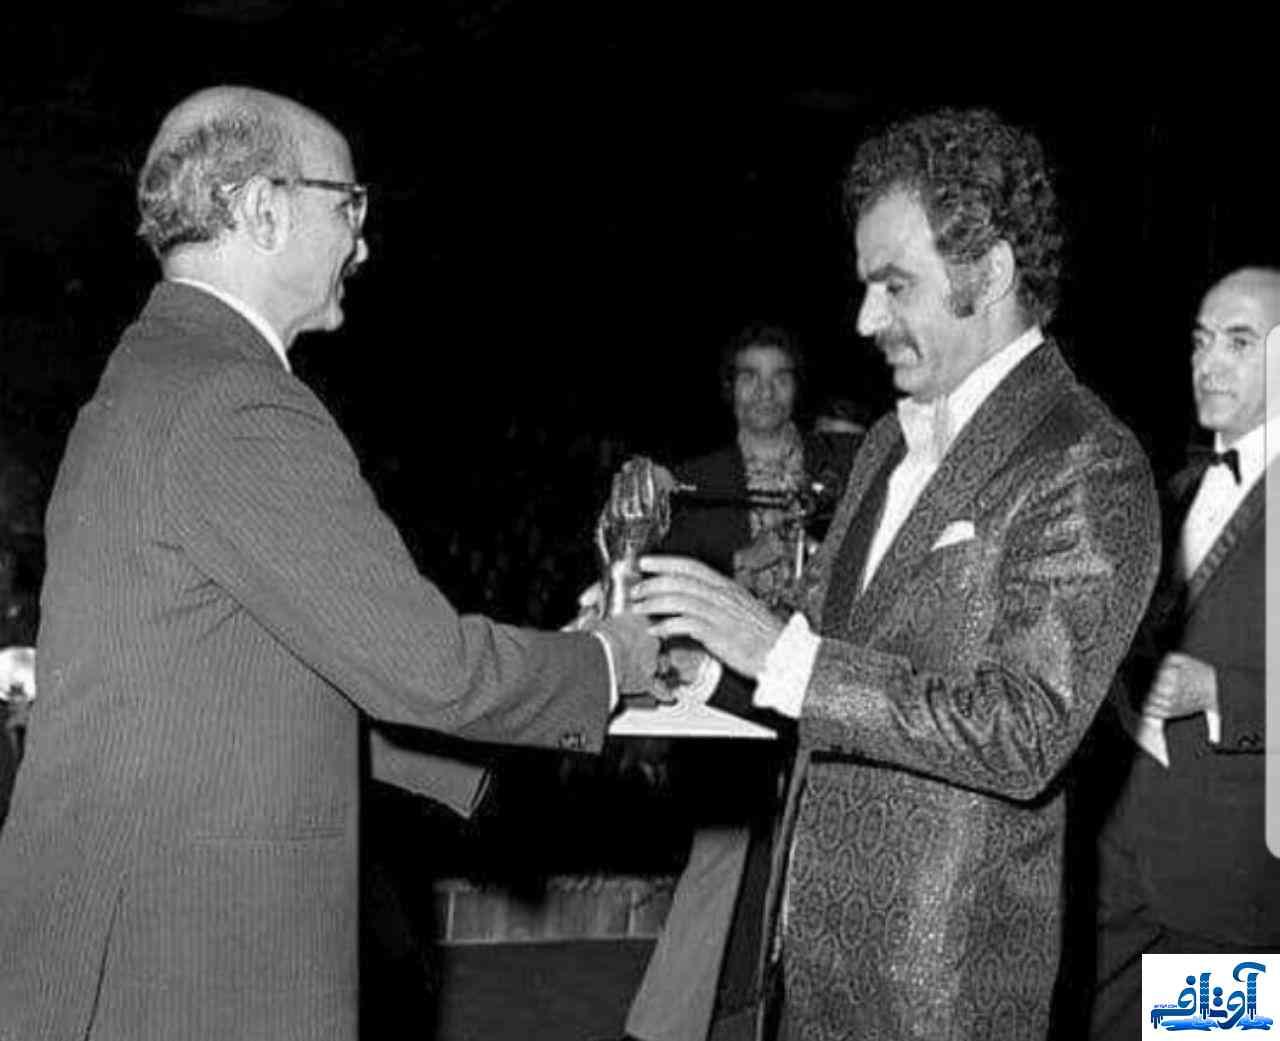 جایزه ناصر ملک مطیعی,دزدیده شدن جایزه ناصر ملک مطیعی